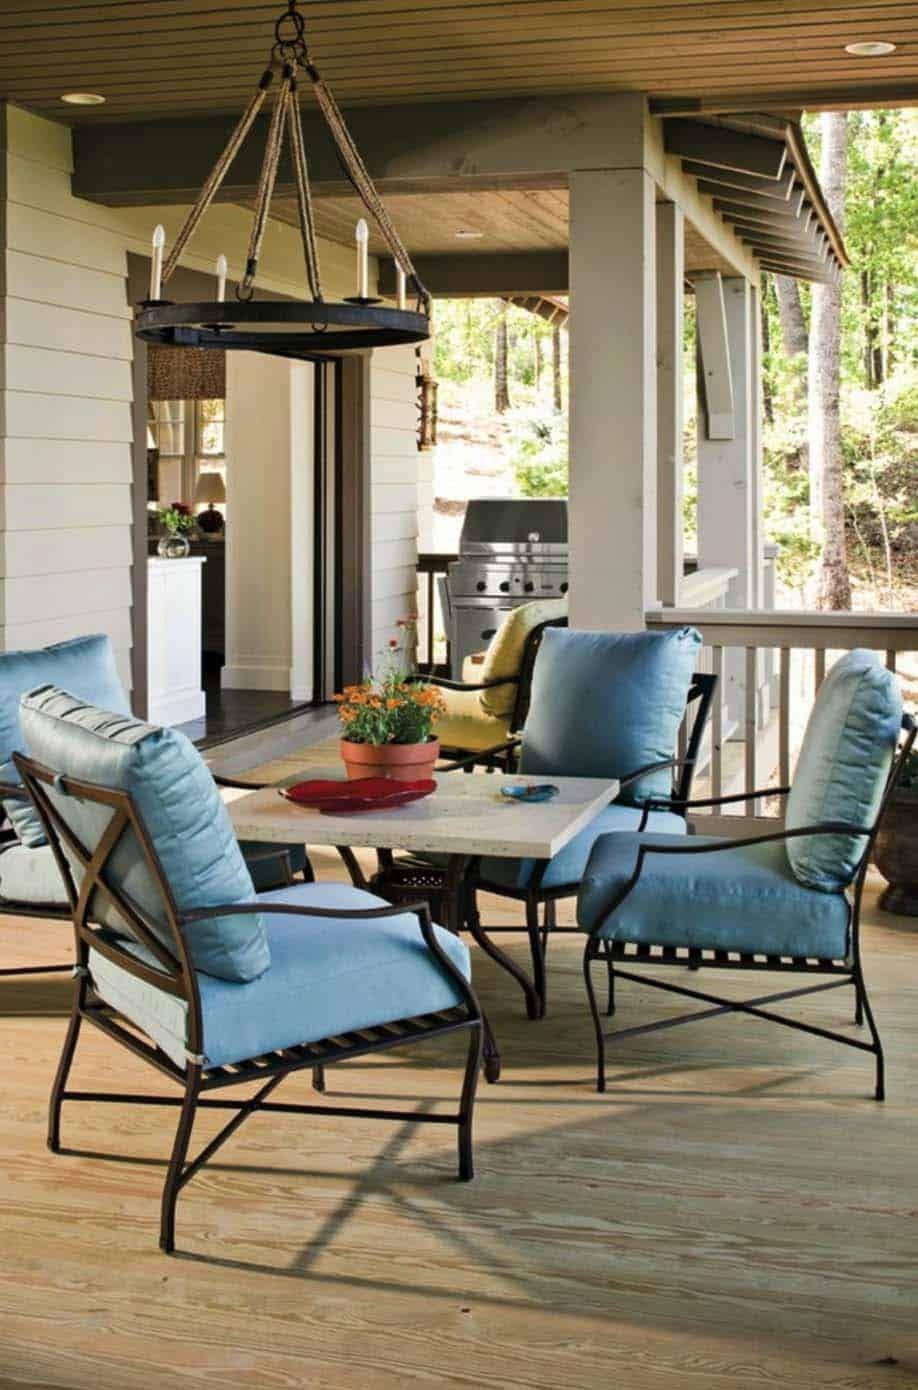 30 Amazing Beach Style Deck Ideas Promoting Relaxation Outdoor Living Space Outdoor Living Outdoor Living Design